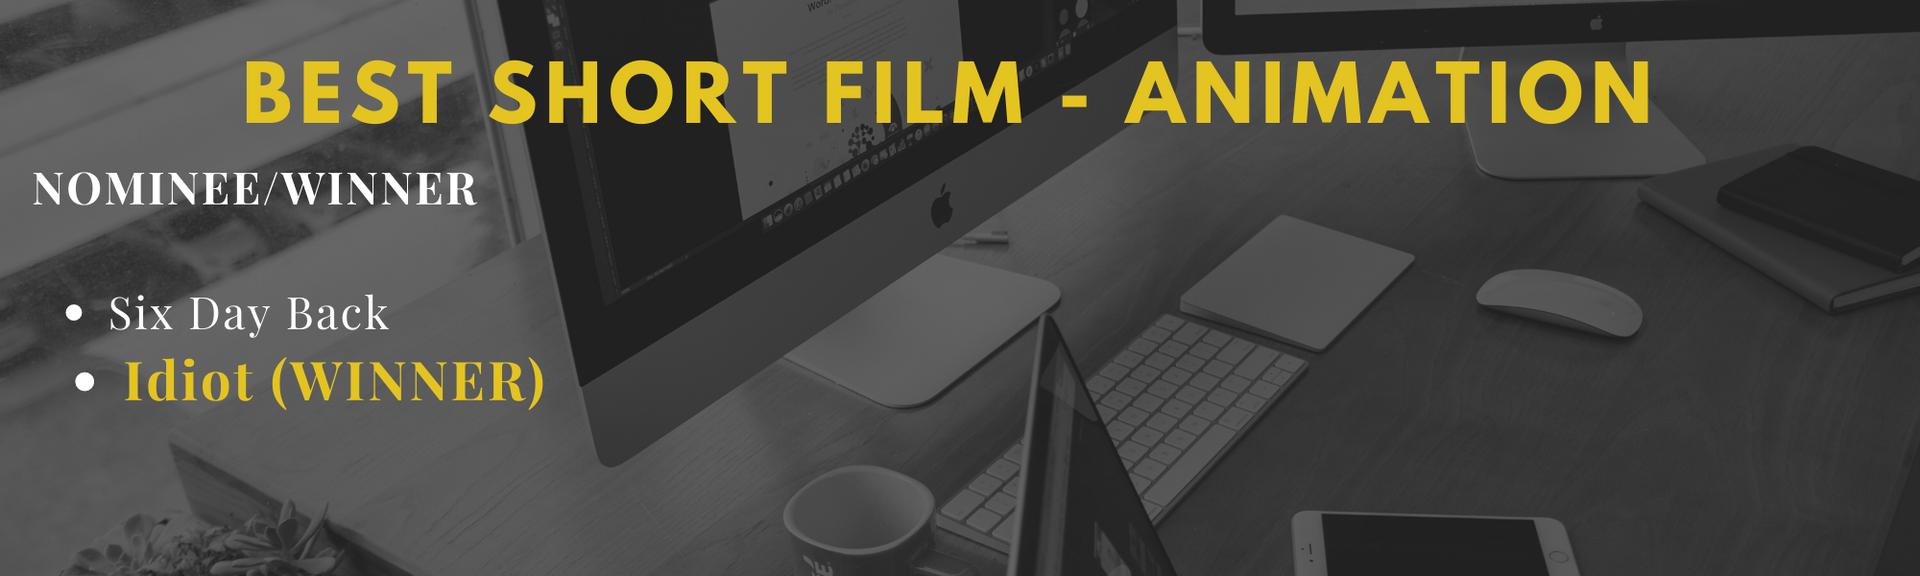 Best Short Film - Animation